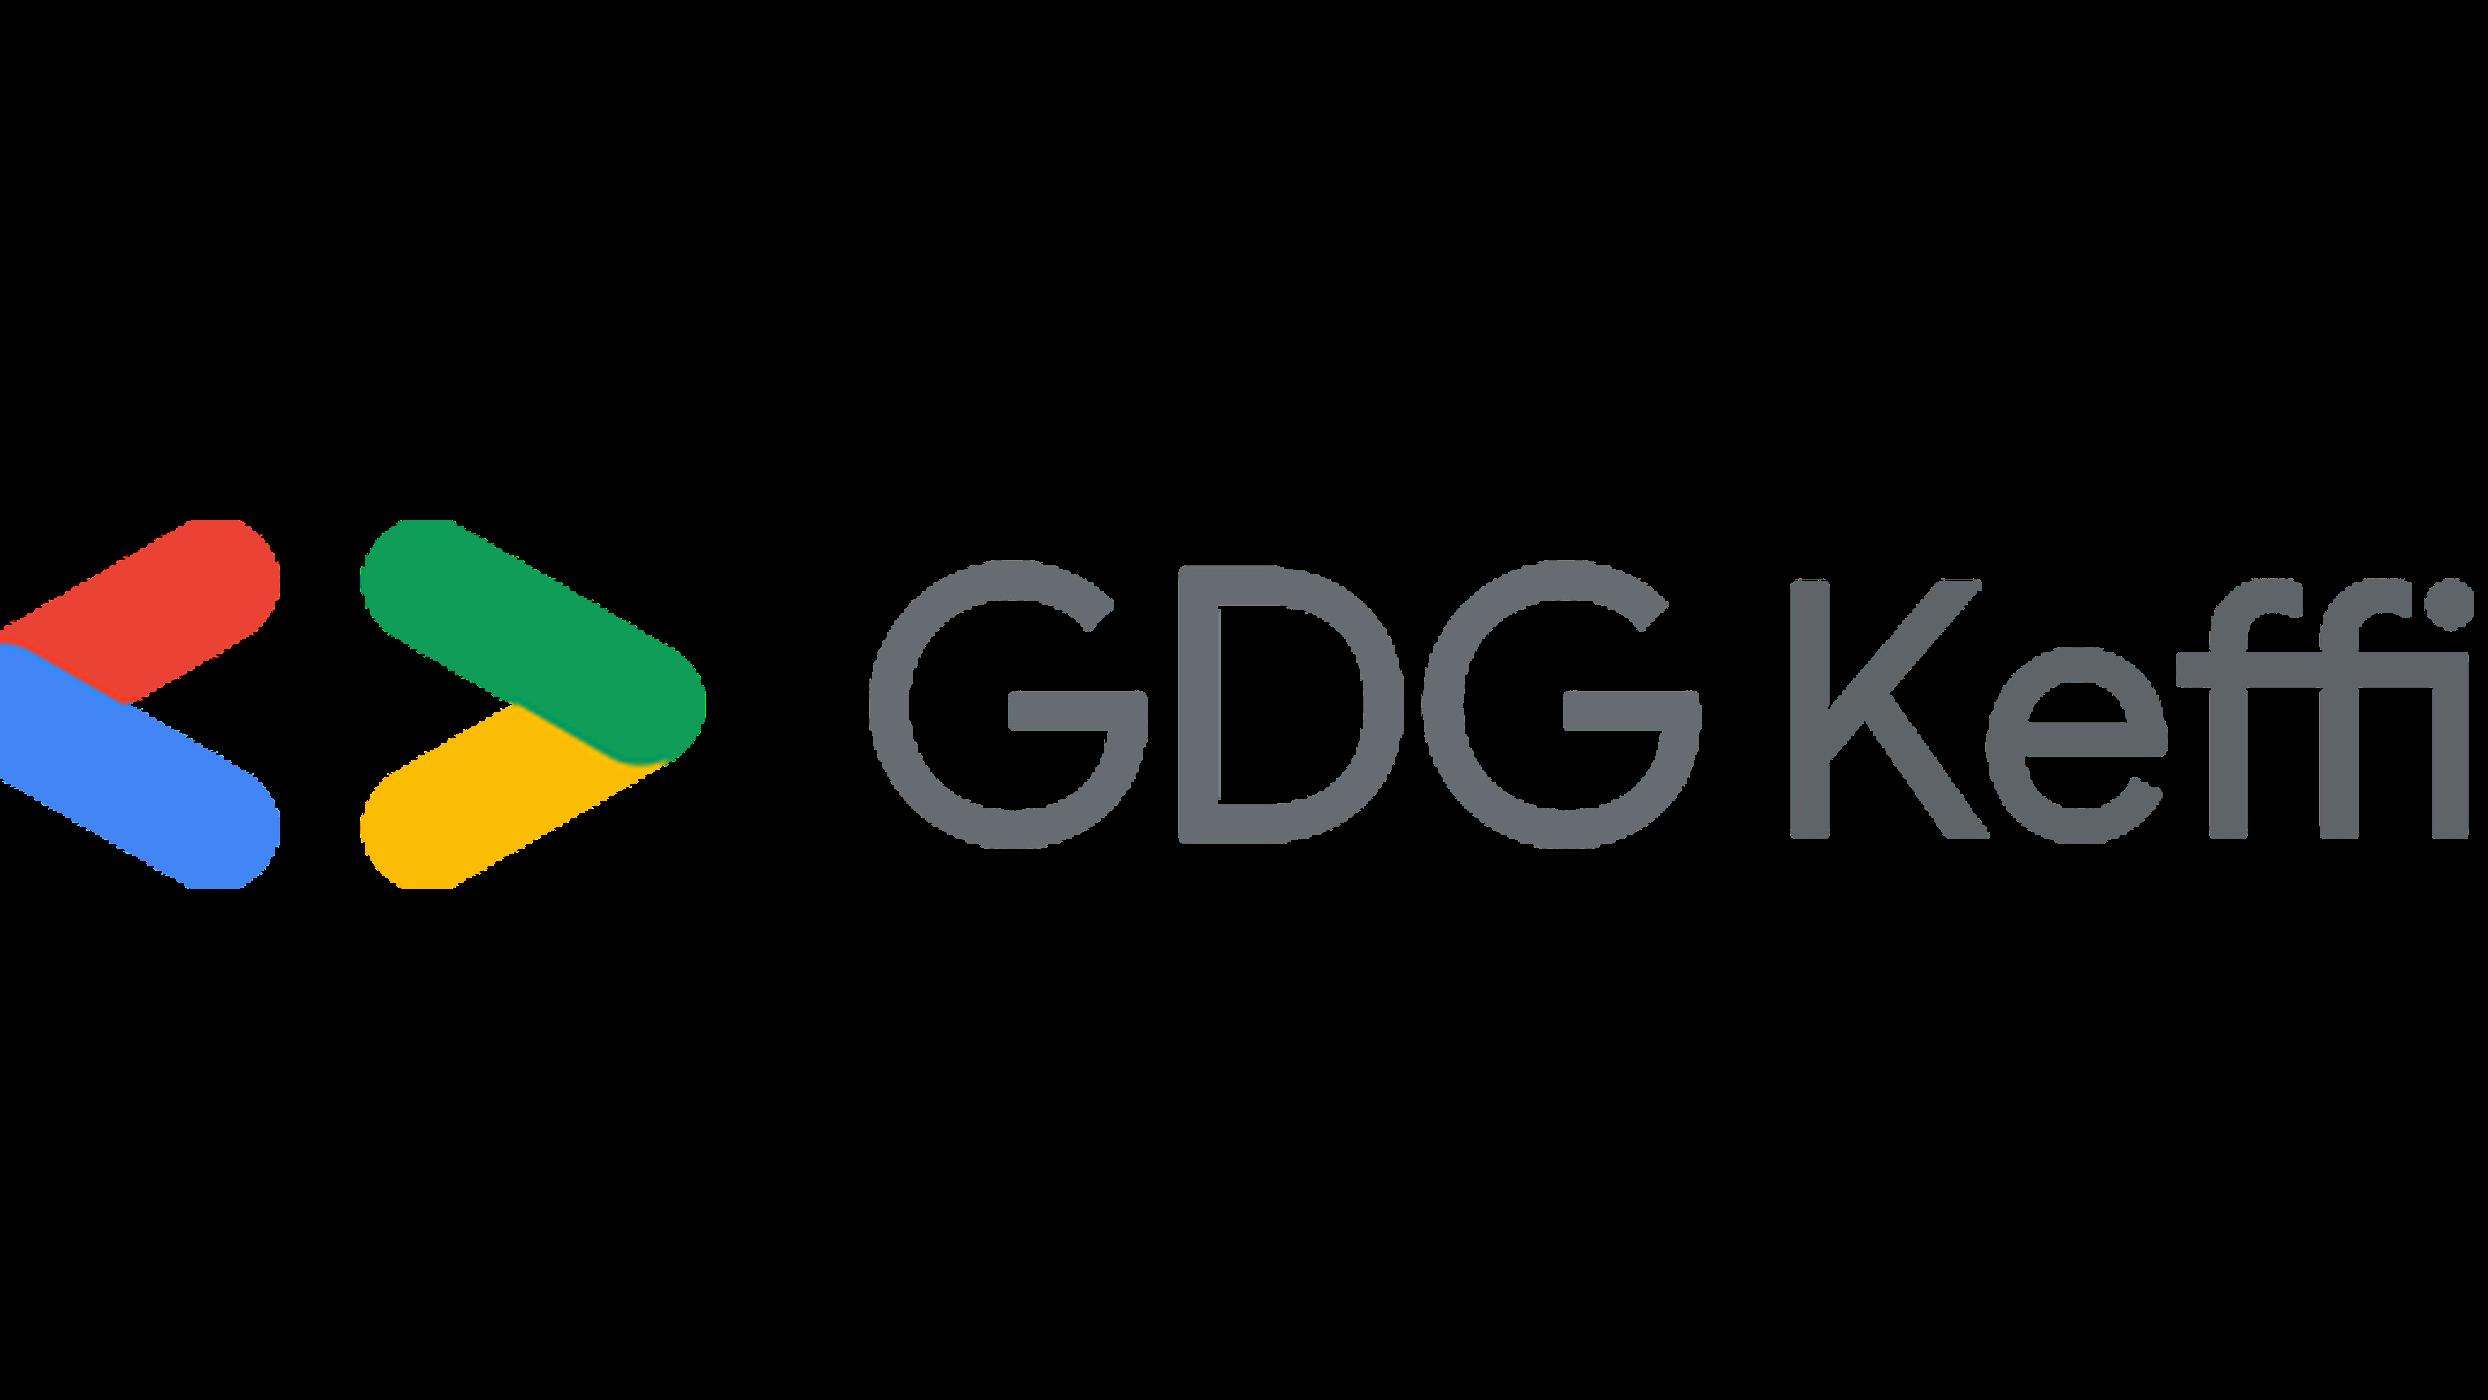 GDG Keffi